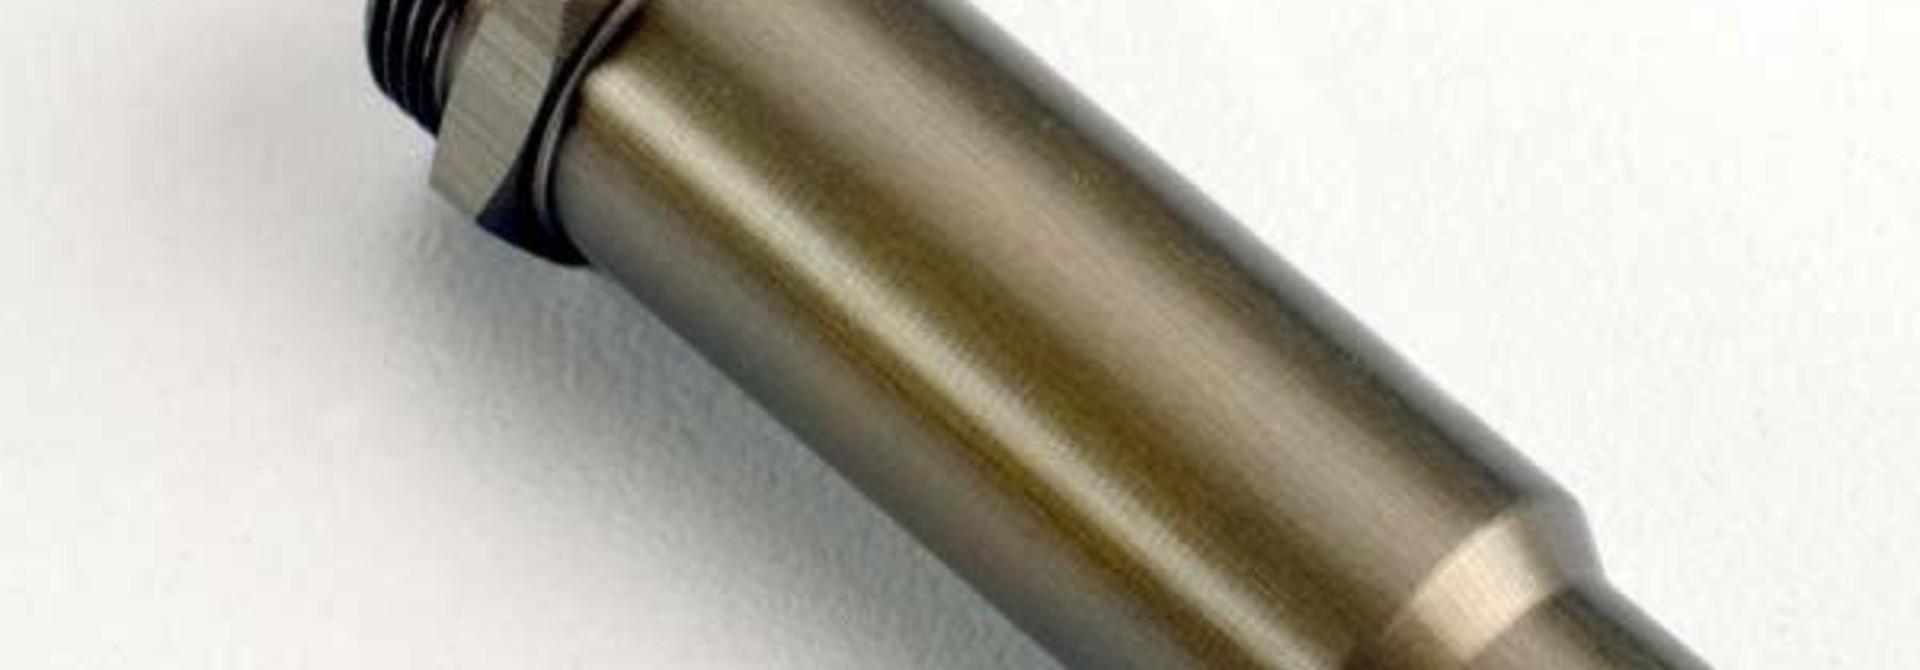 Big Bore Shock Cylinder (X-Long) (1)